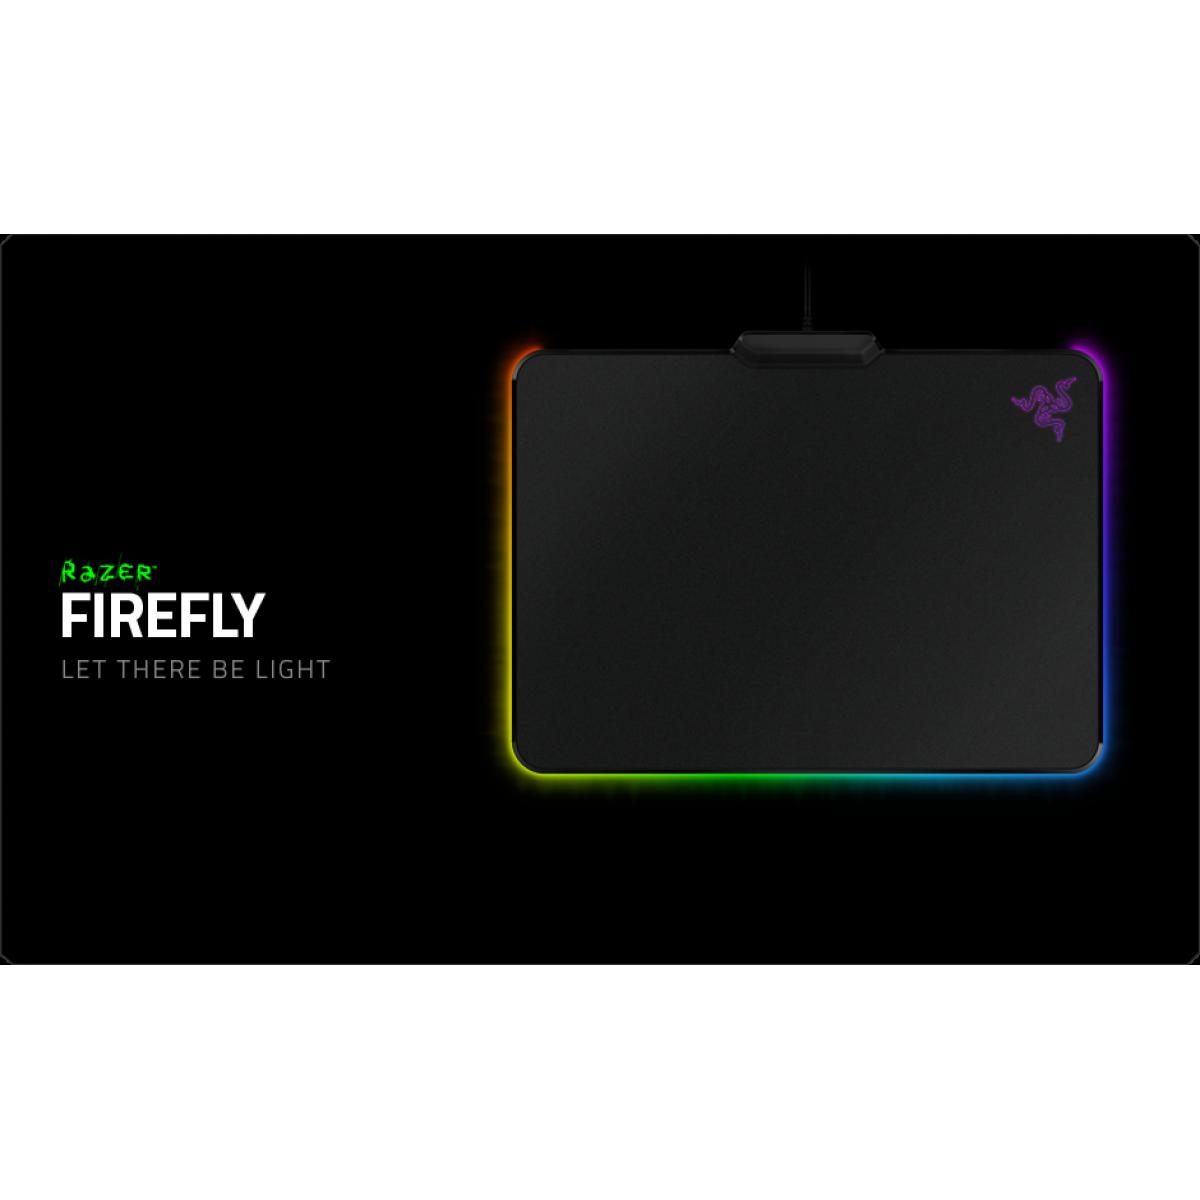 Razer Firefly Hard Gaming Mouse Mat Chroma Rz02